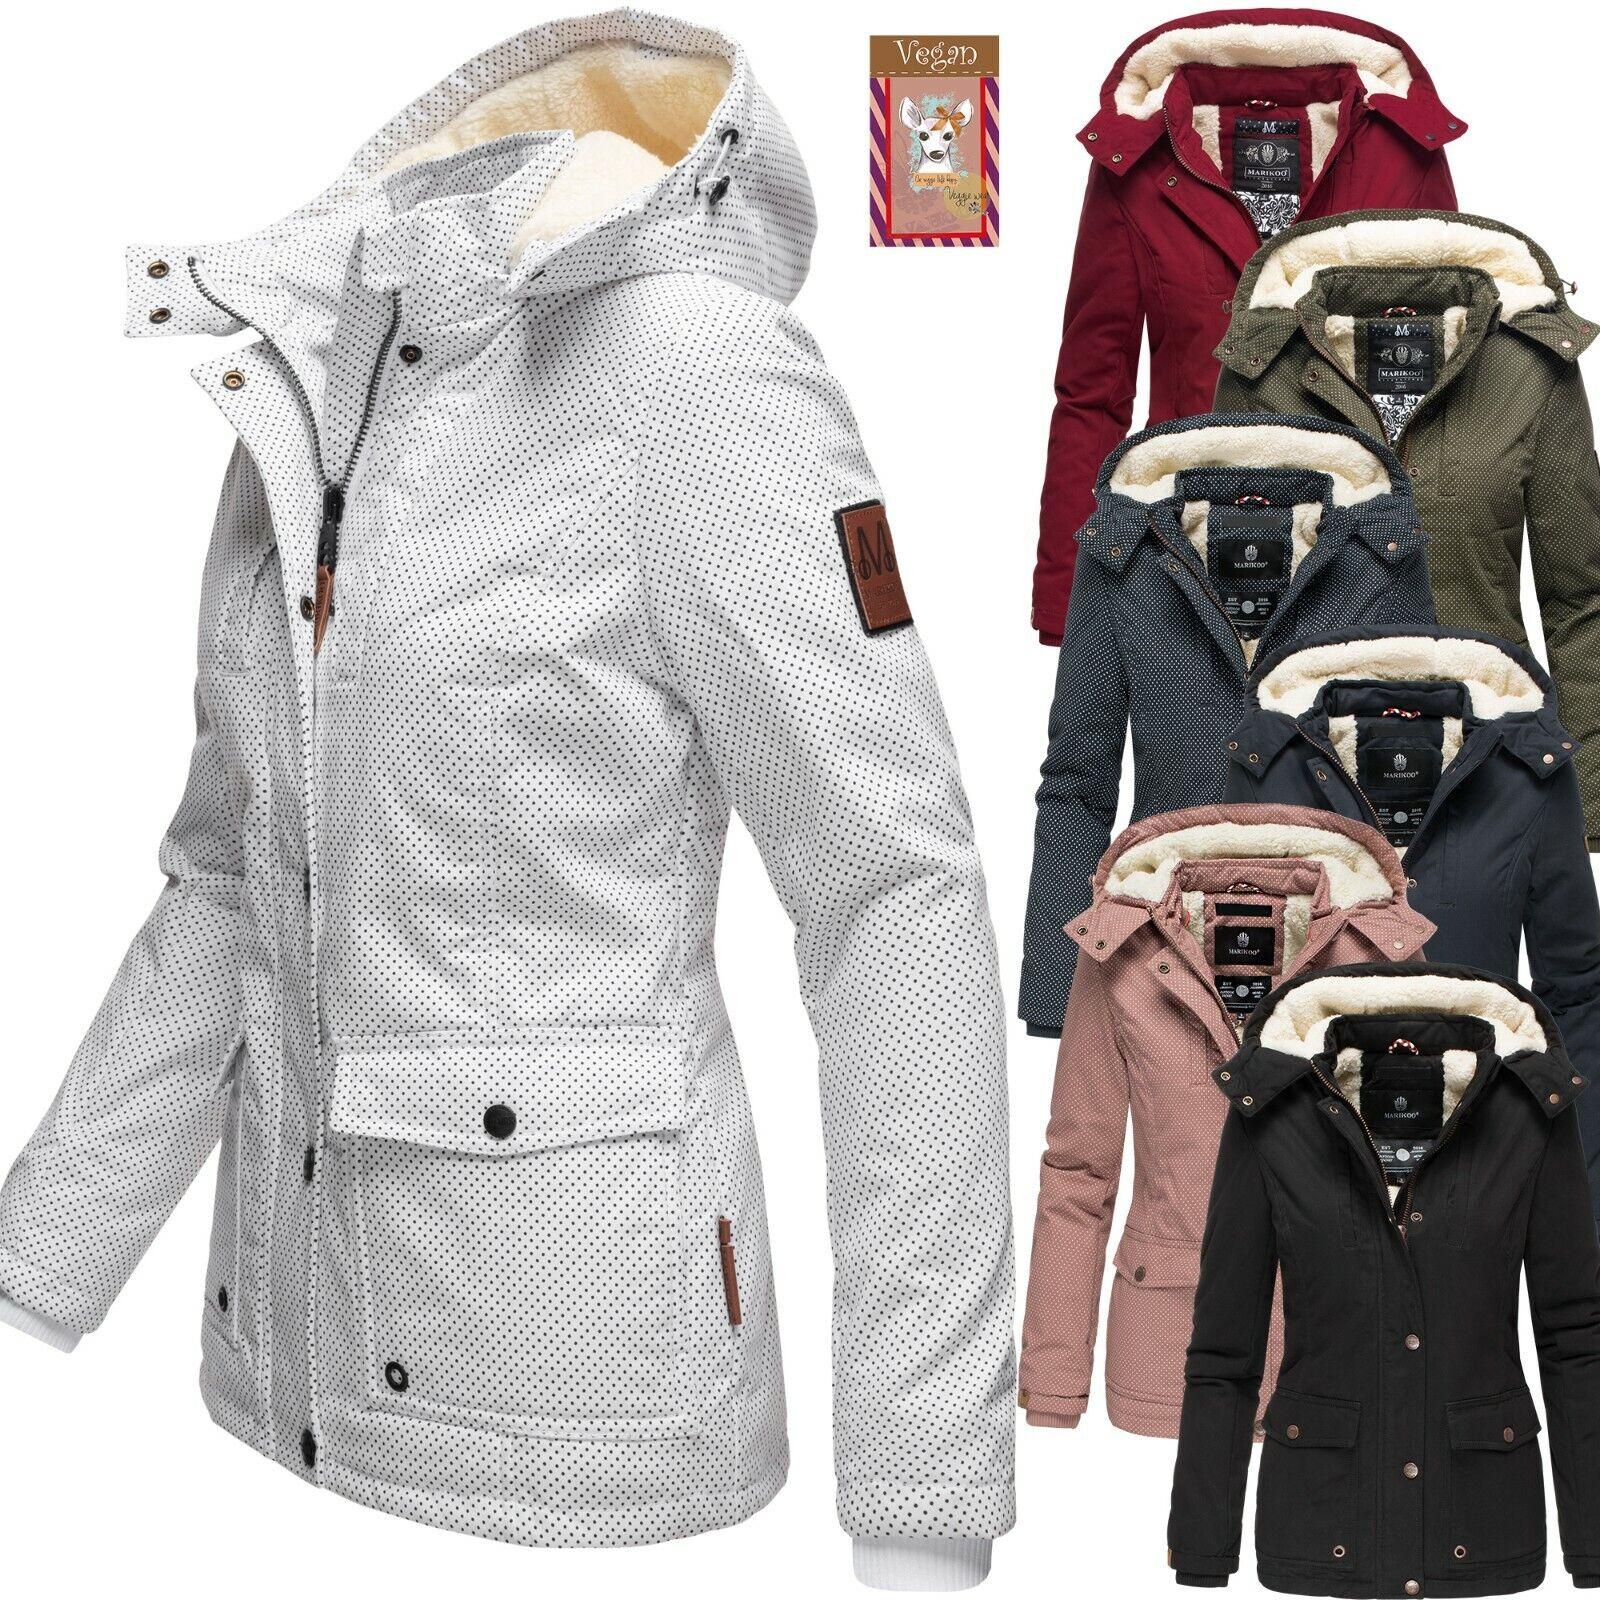 Marikoo Damen Jacke Winterjacke Kurz Mantel Kapuze Parka Print Teddyfell Keikoo